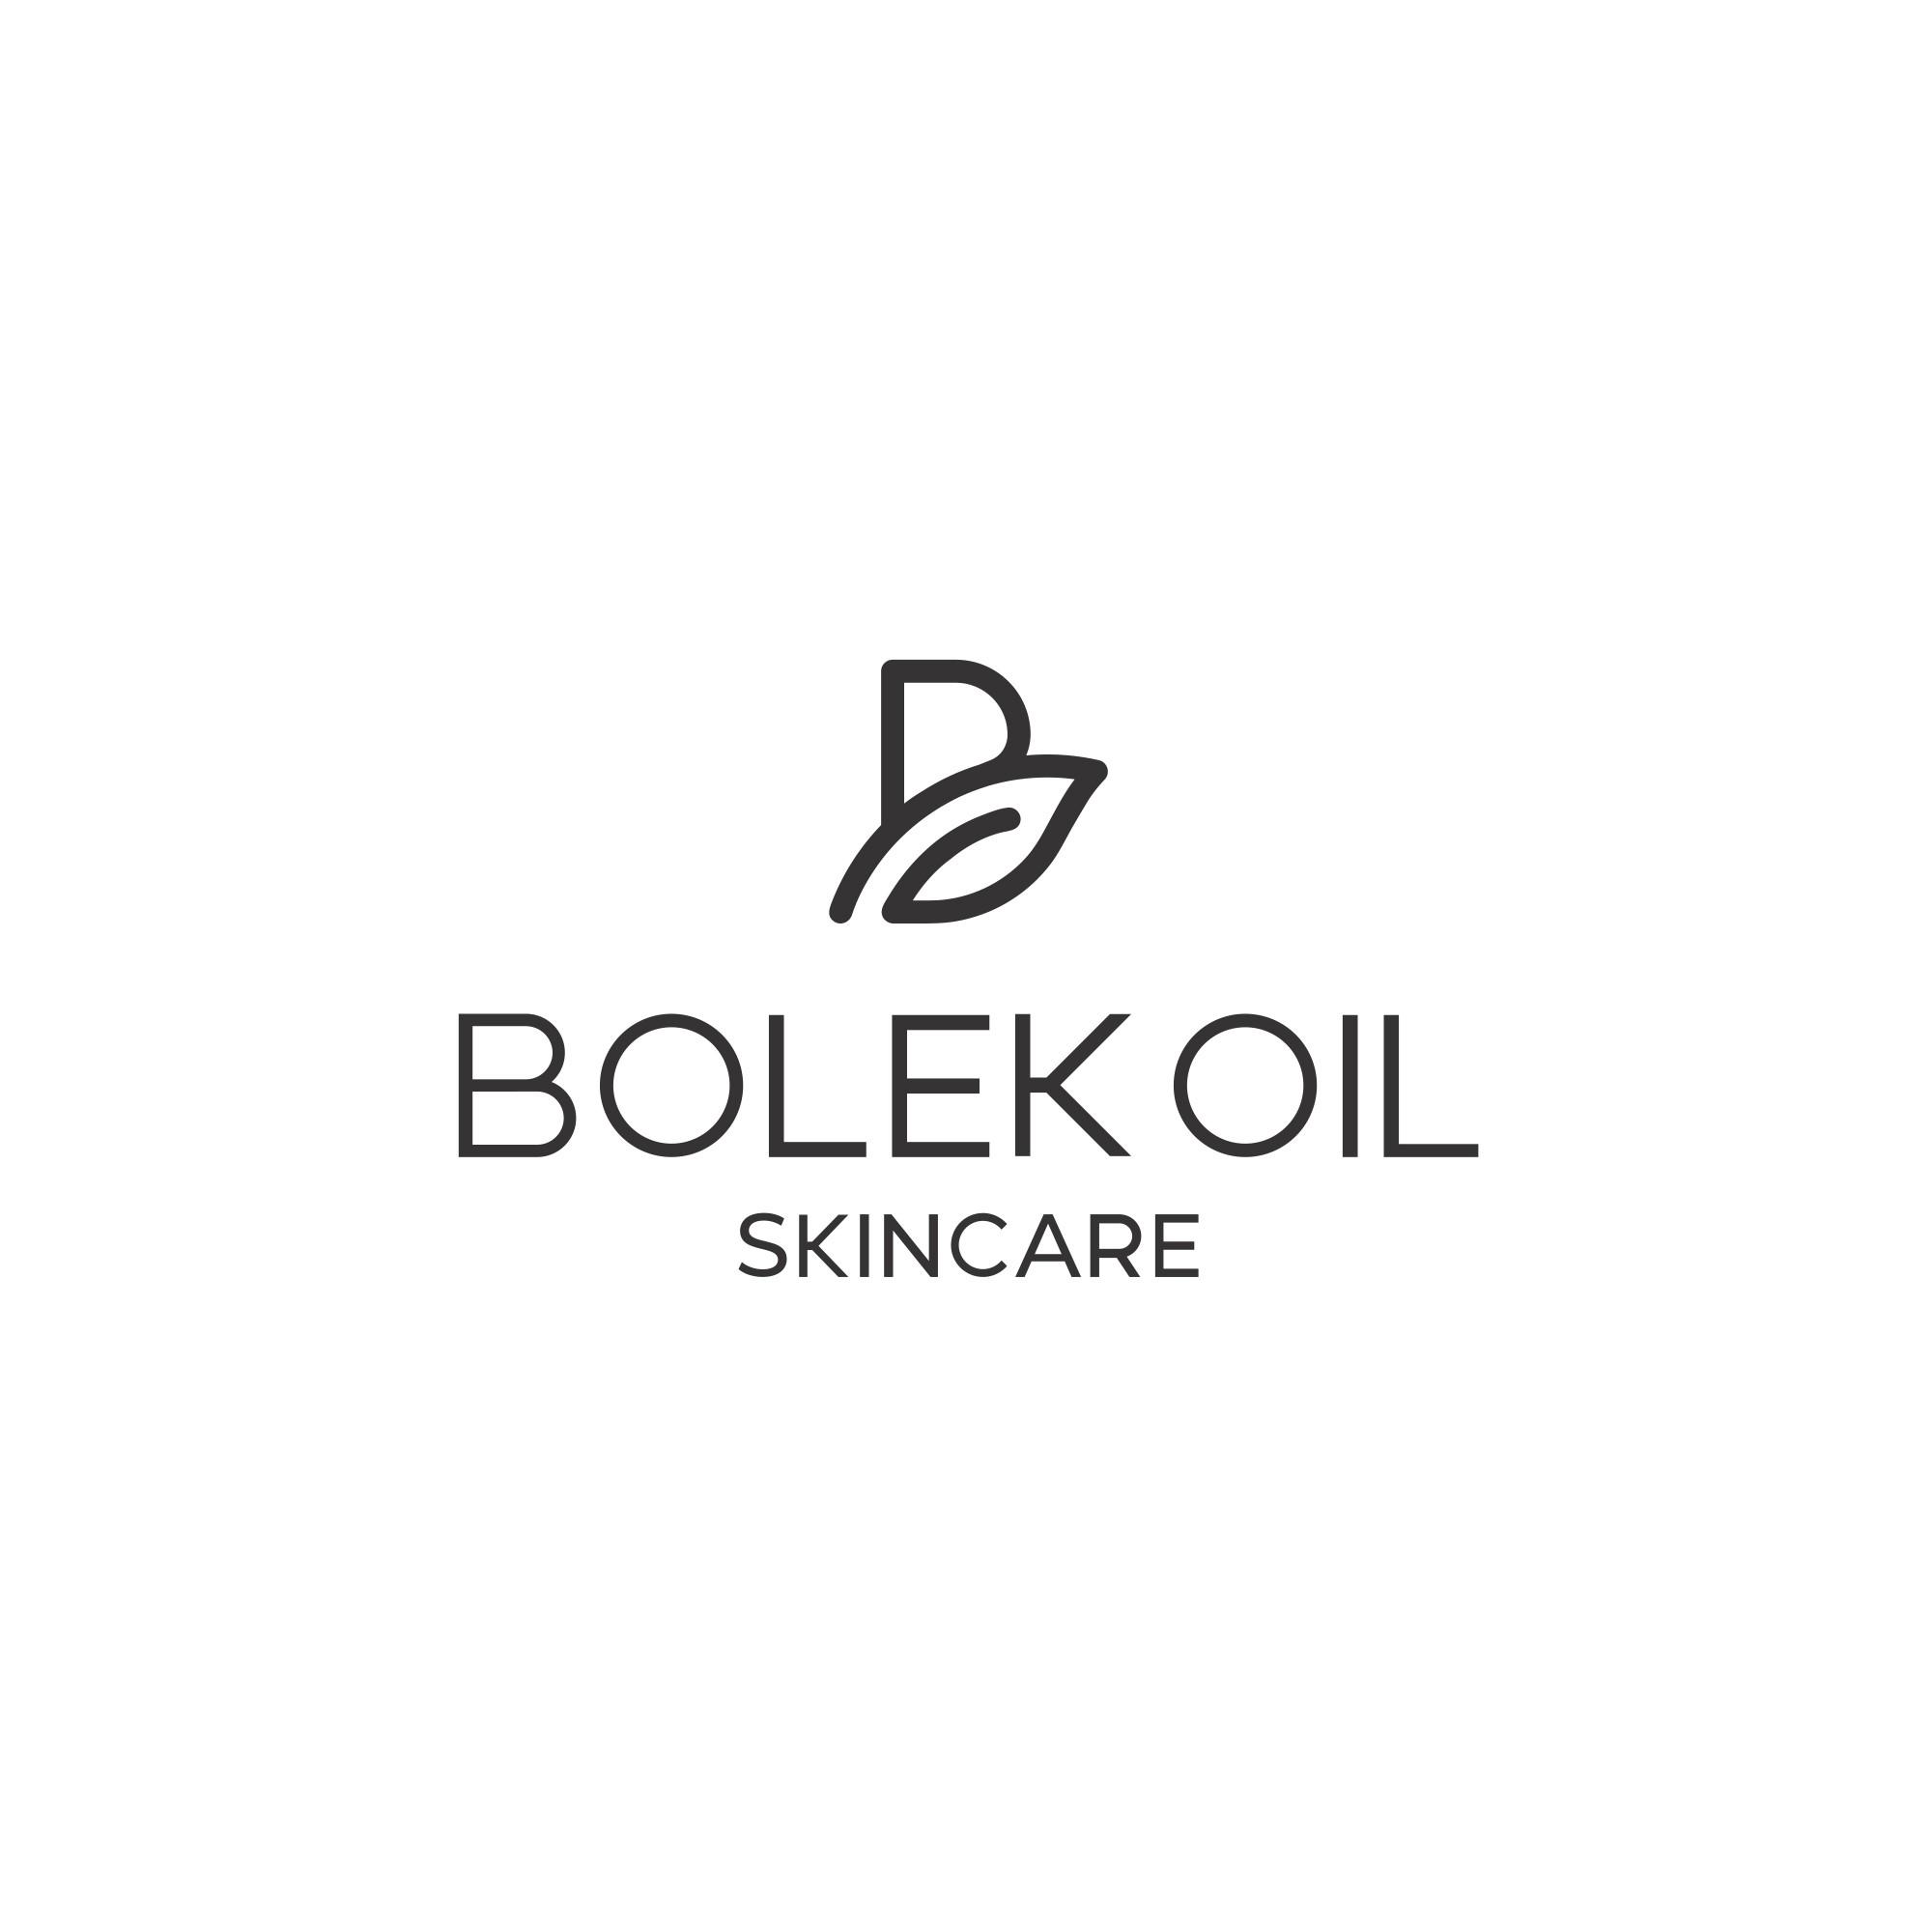 New skincare company seeking elegant and classy small logo design